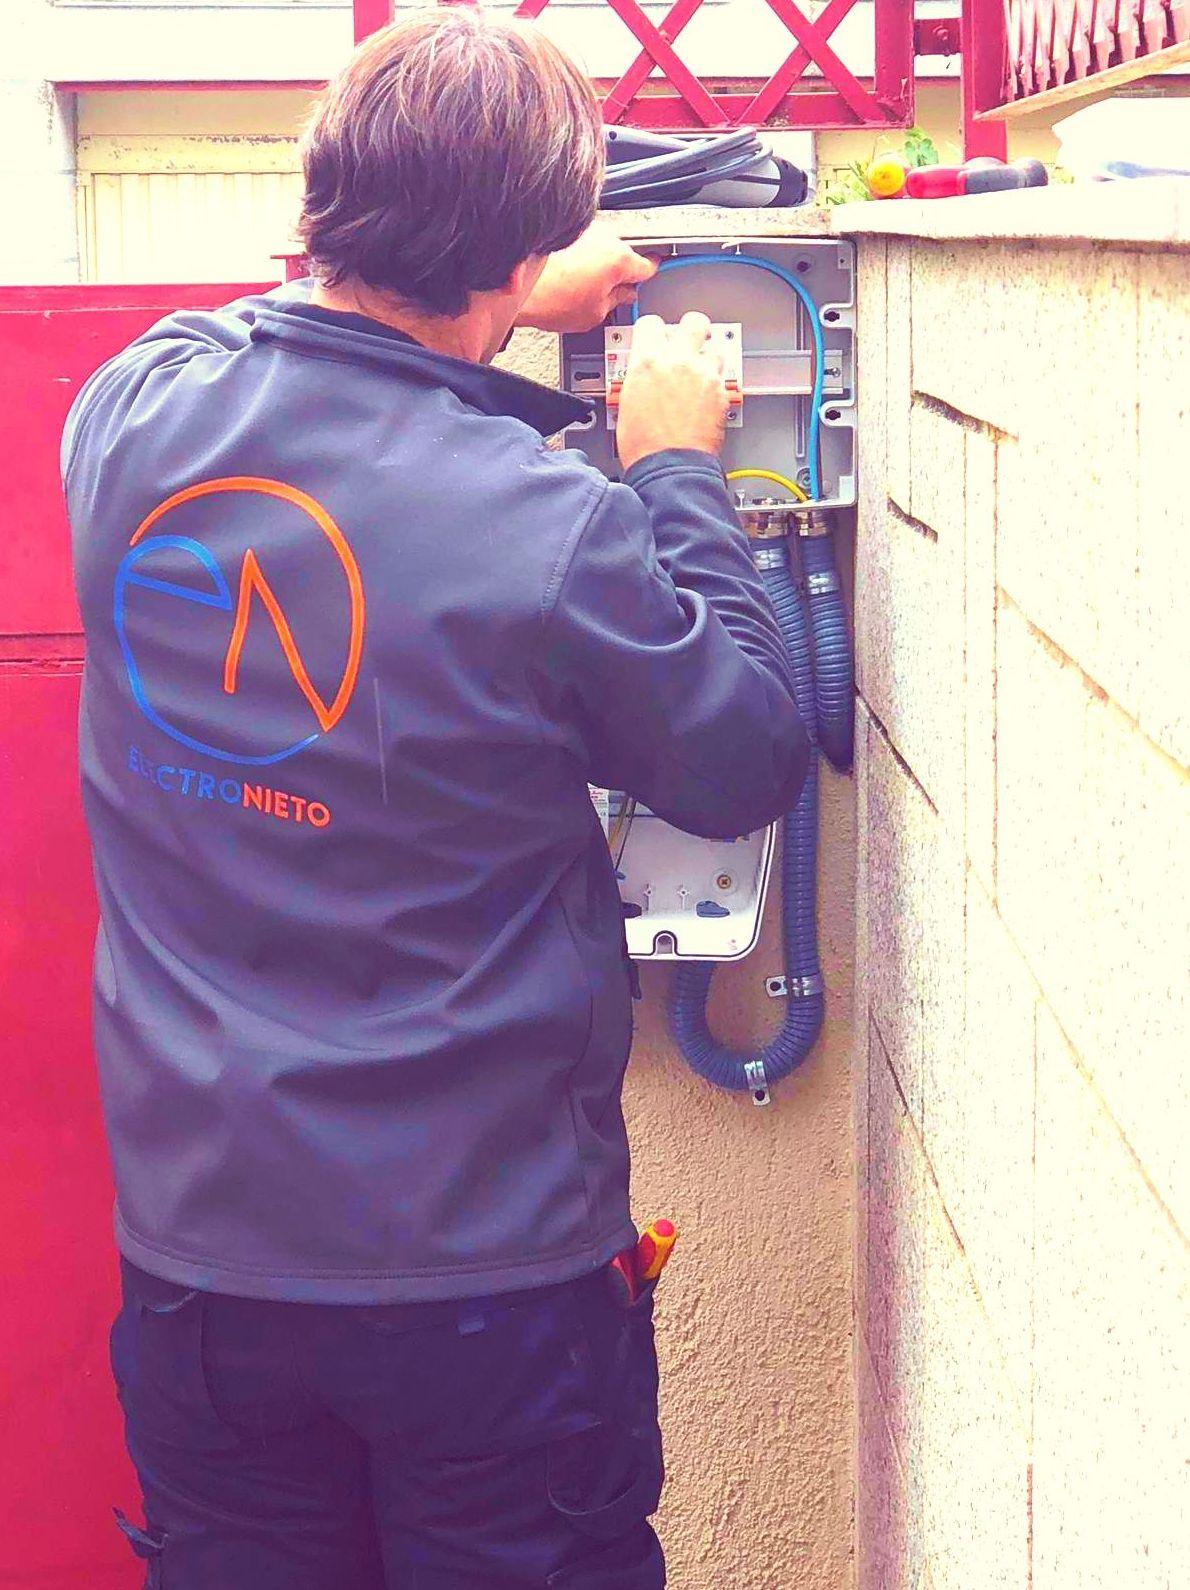 Instalación de punto de recarga para vehículo eléctrico